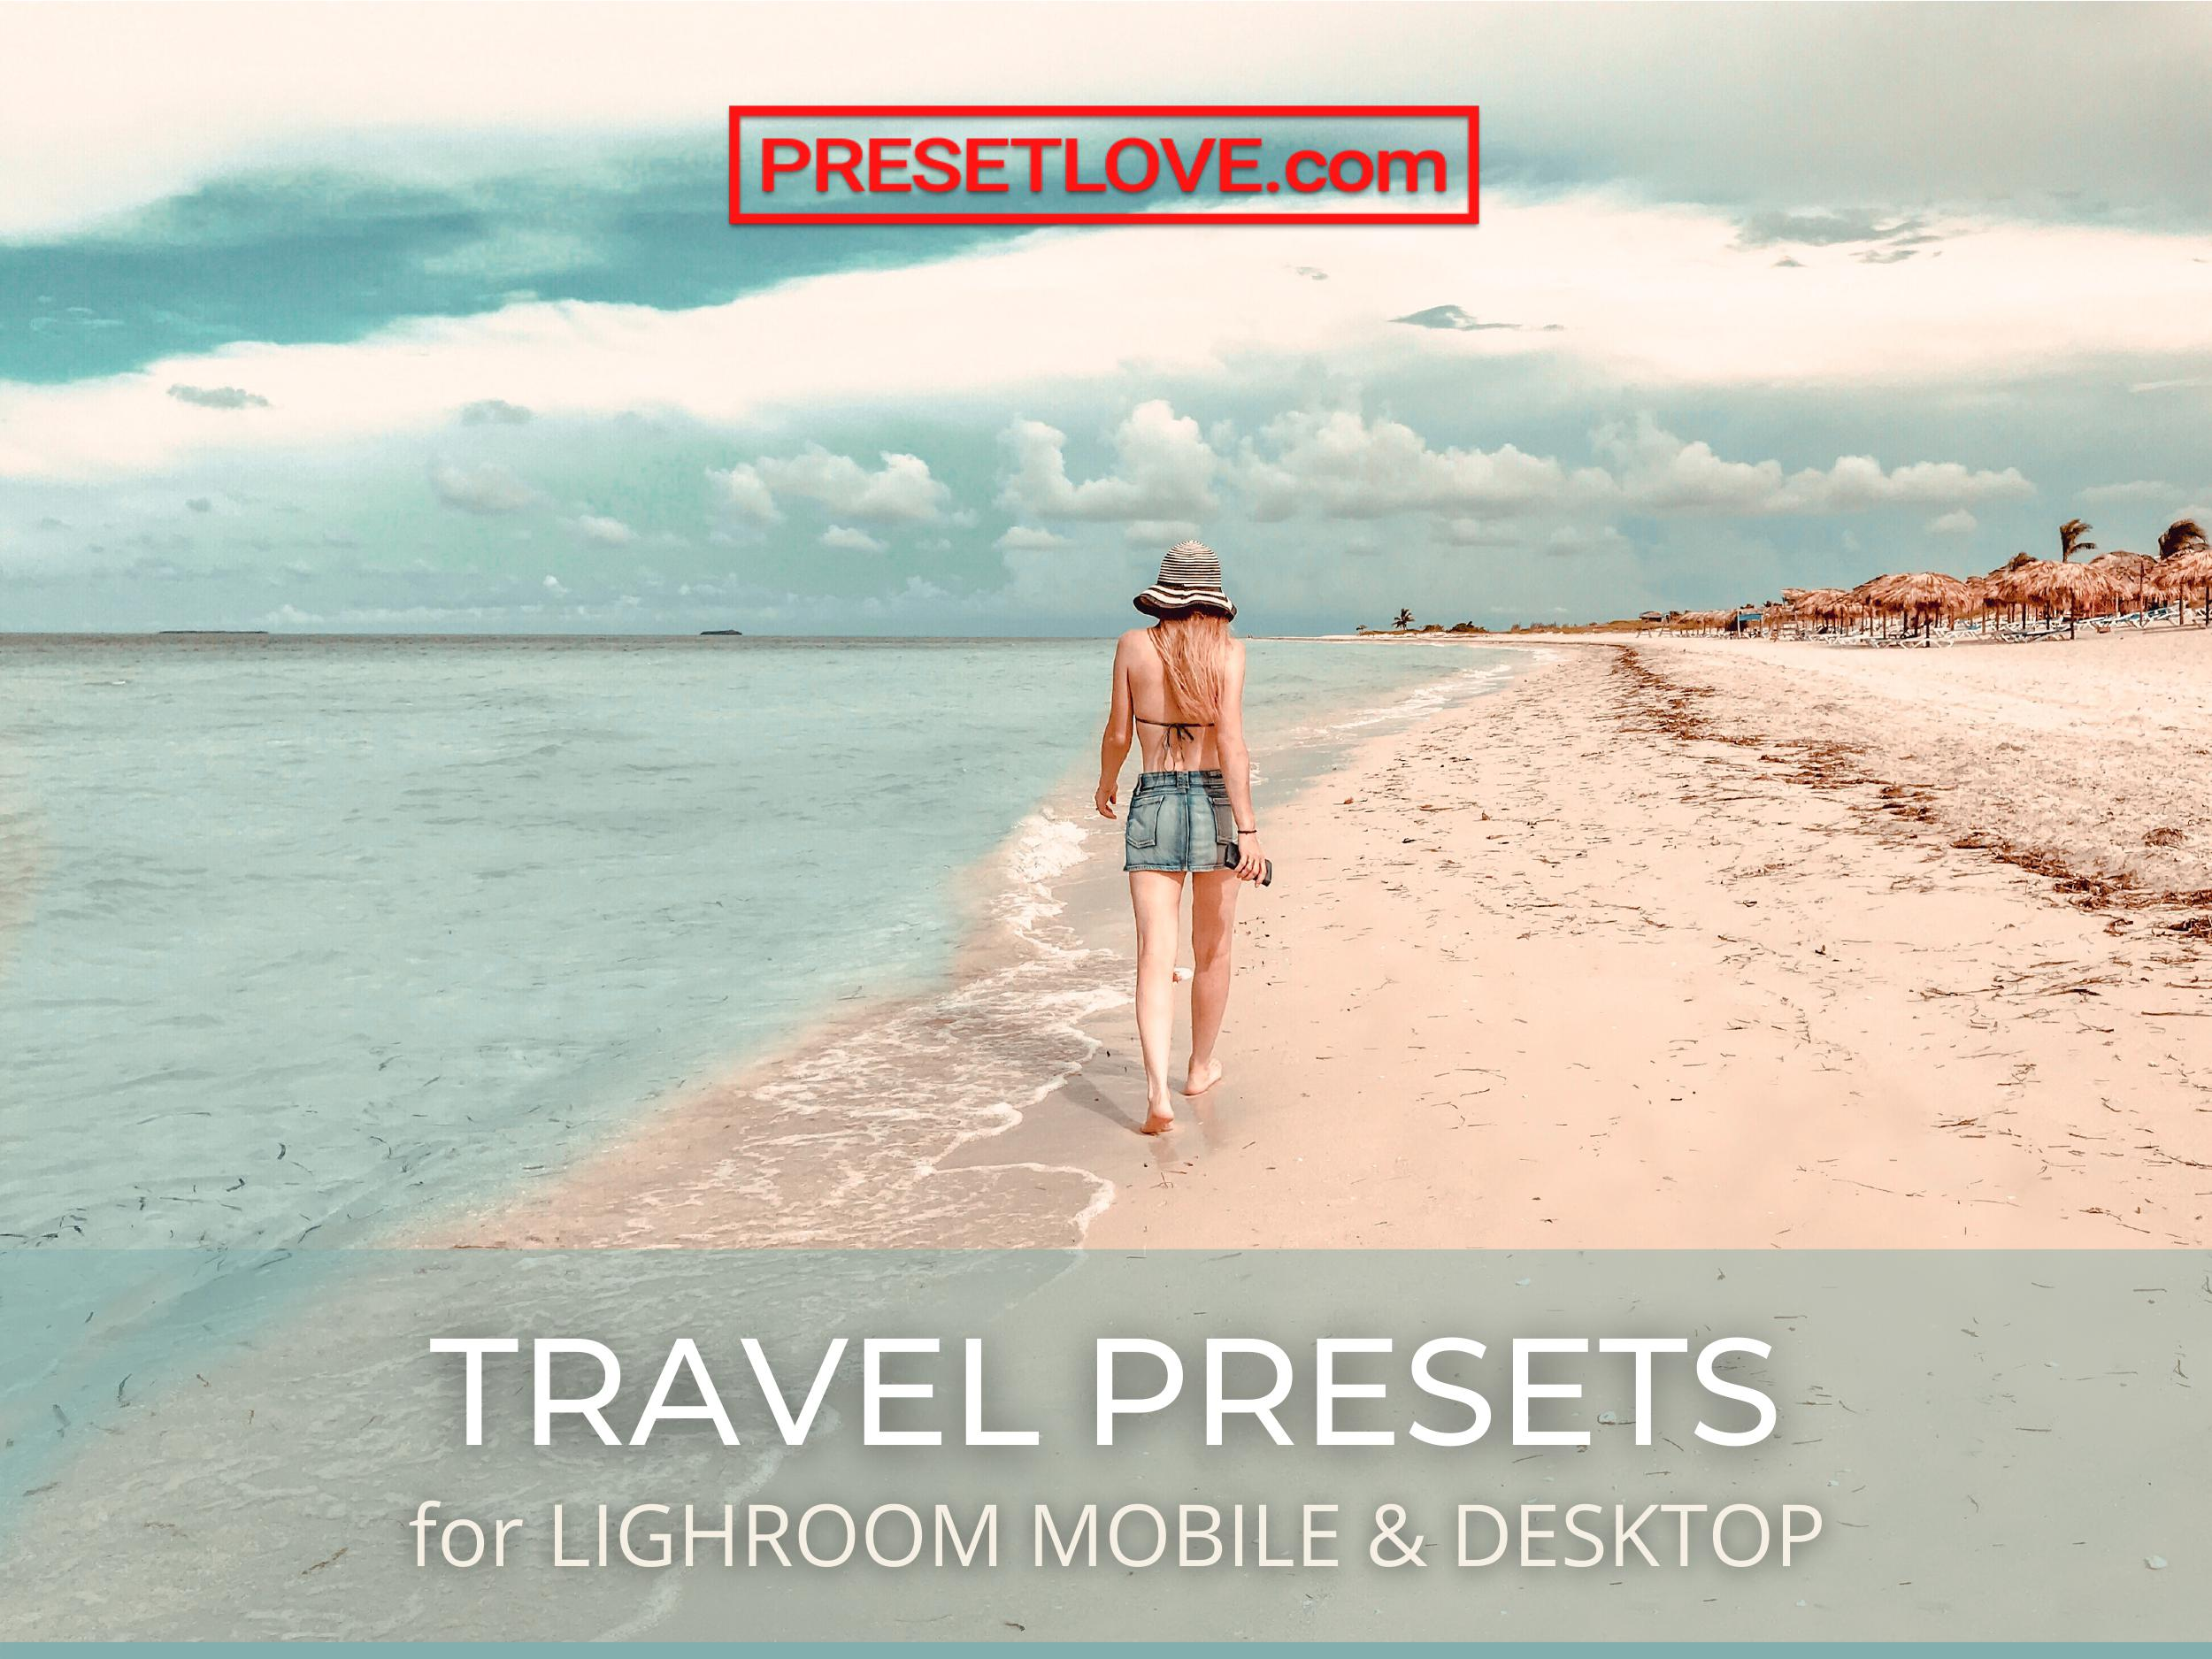 Travel Presets for Lightroom Mobile and Desktop - Free and Premium Preset Downloads